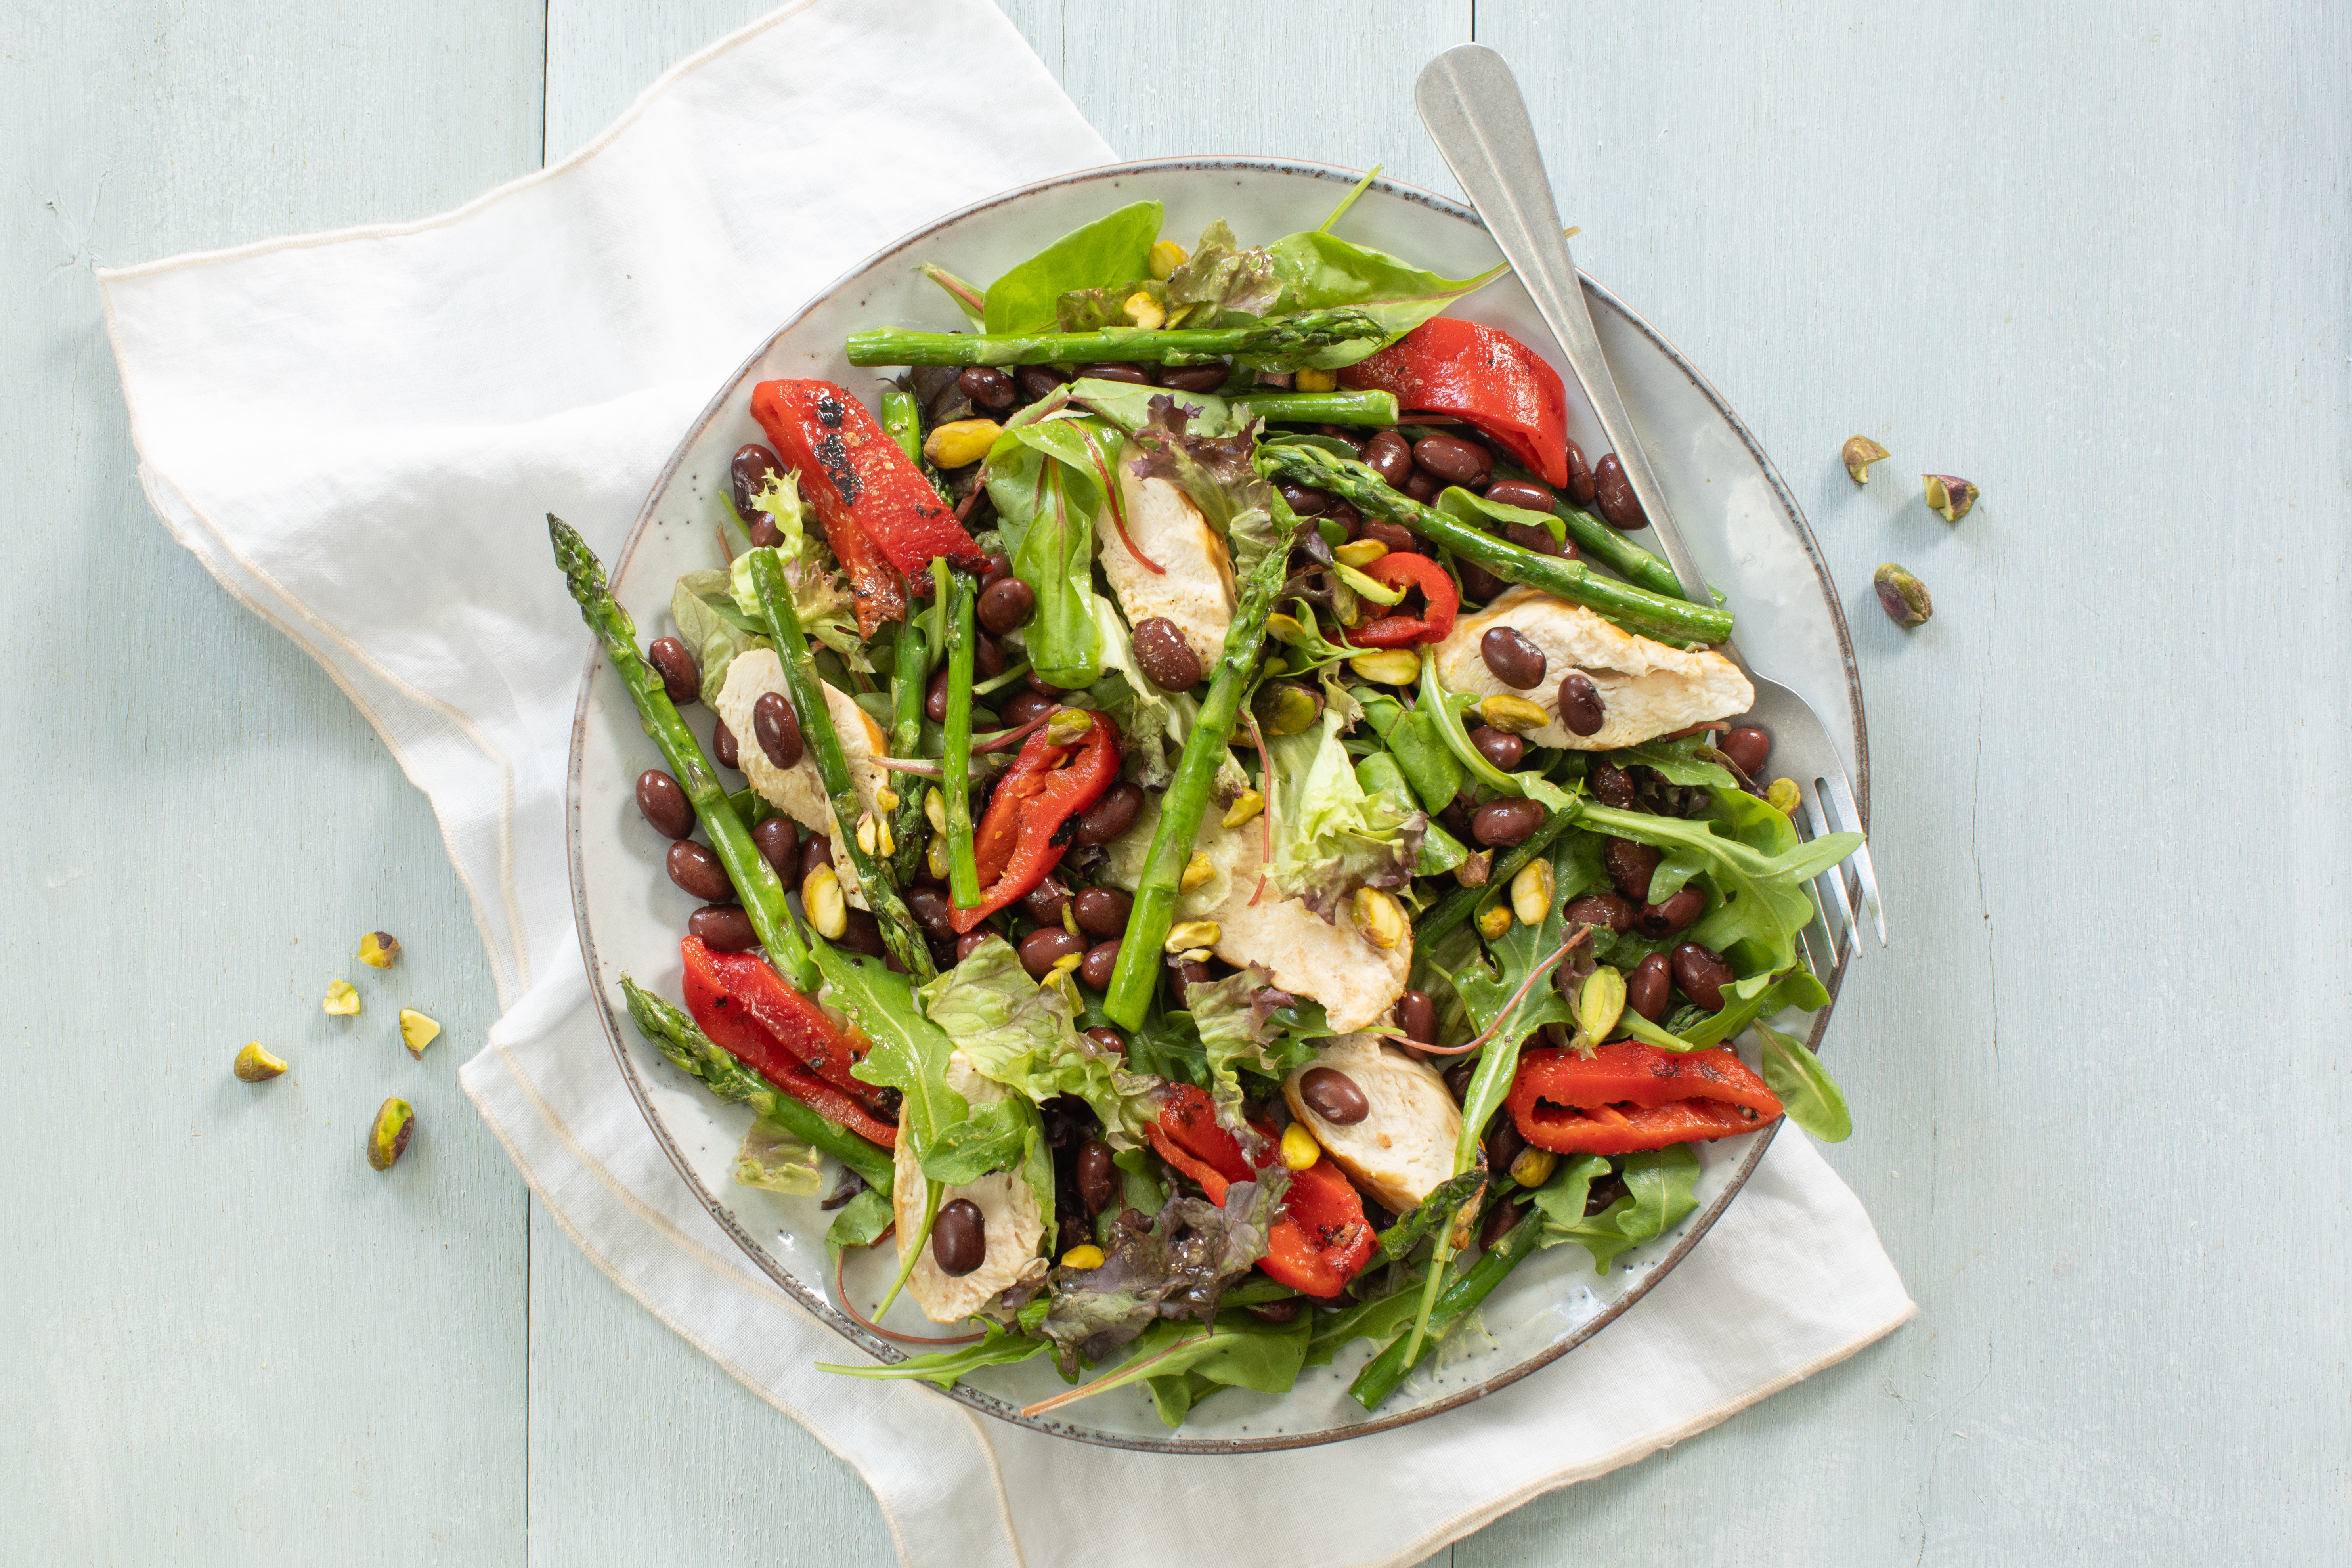 Kidneybonen salade kip nw 01